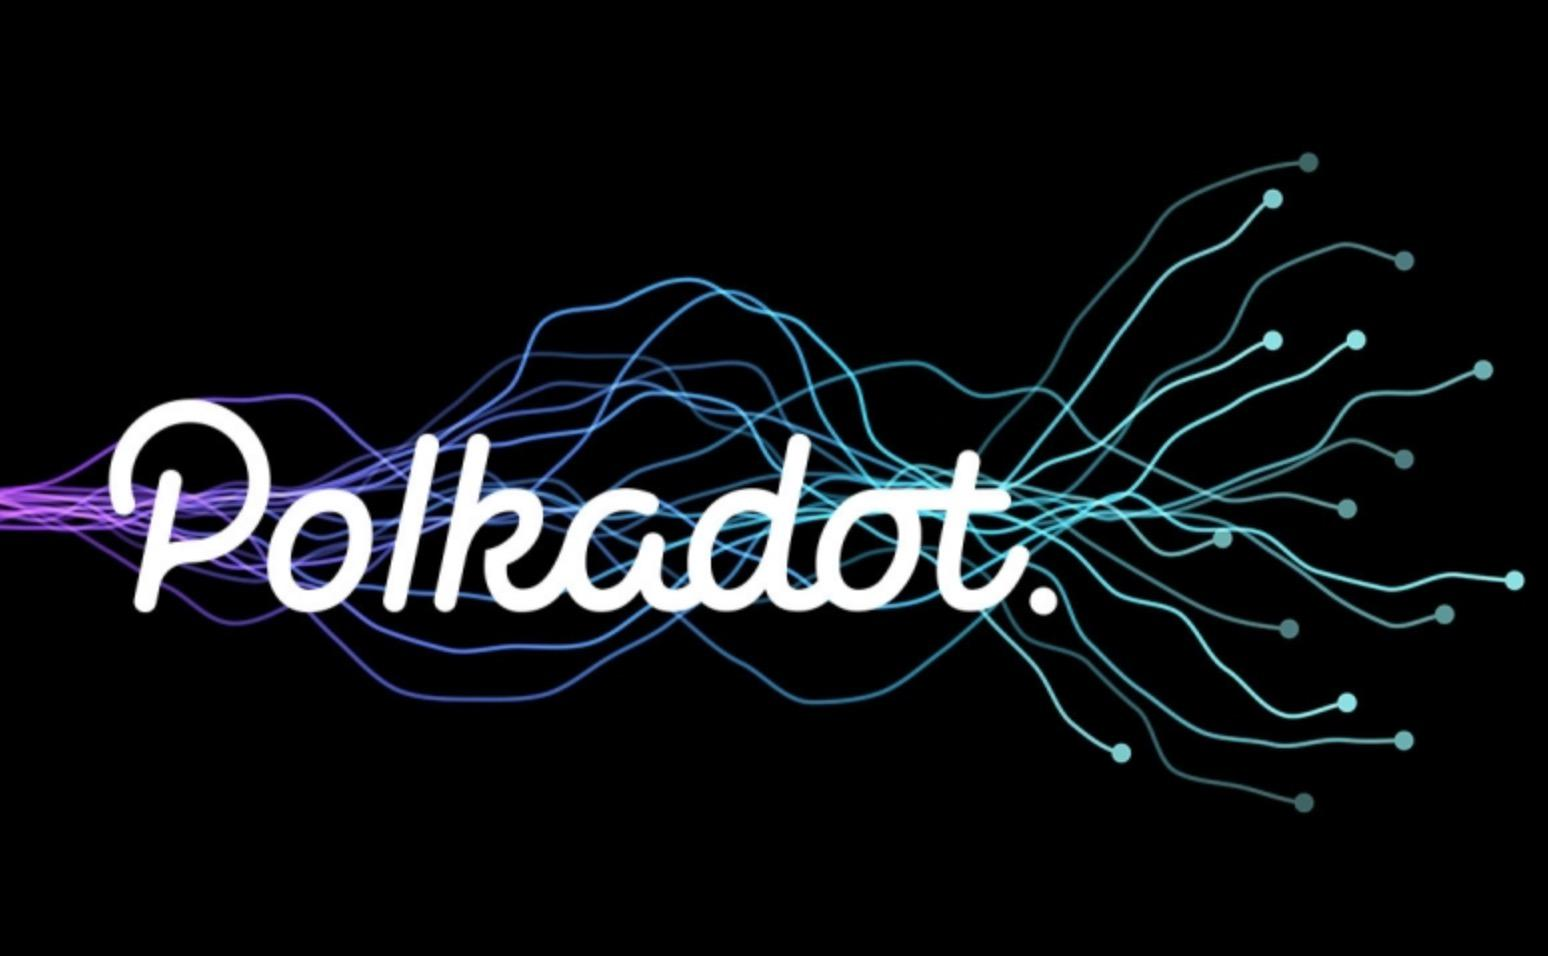 Средневзвешенный курс Polkadot